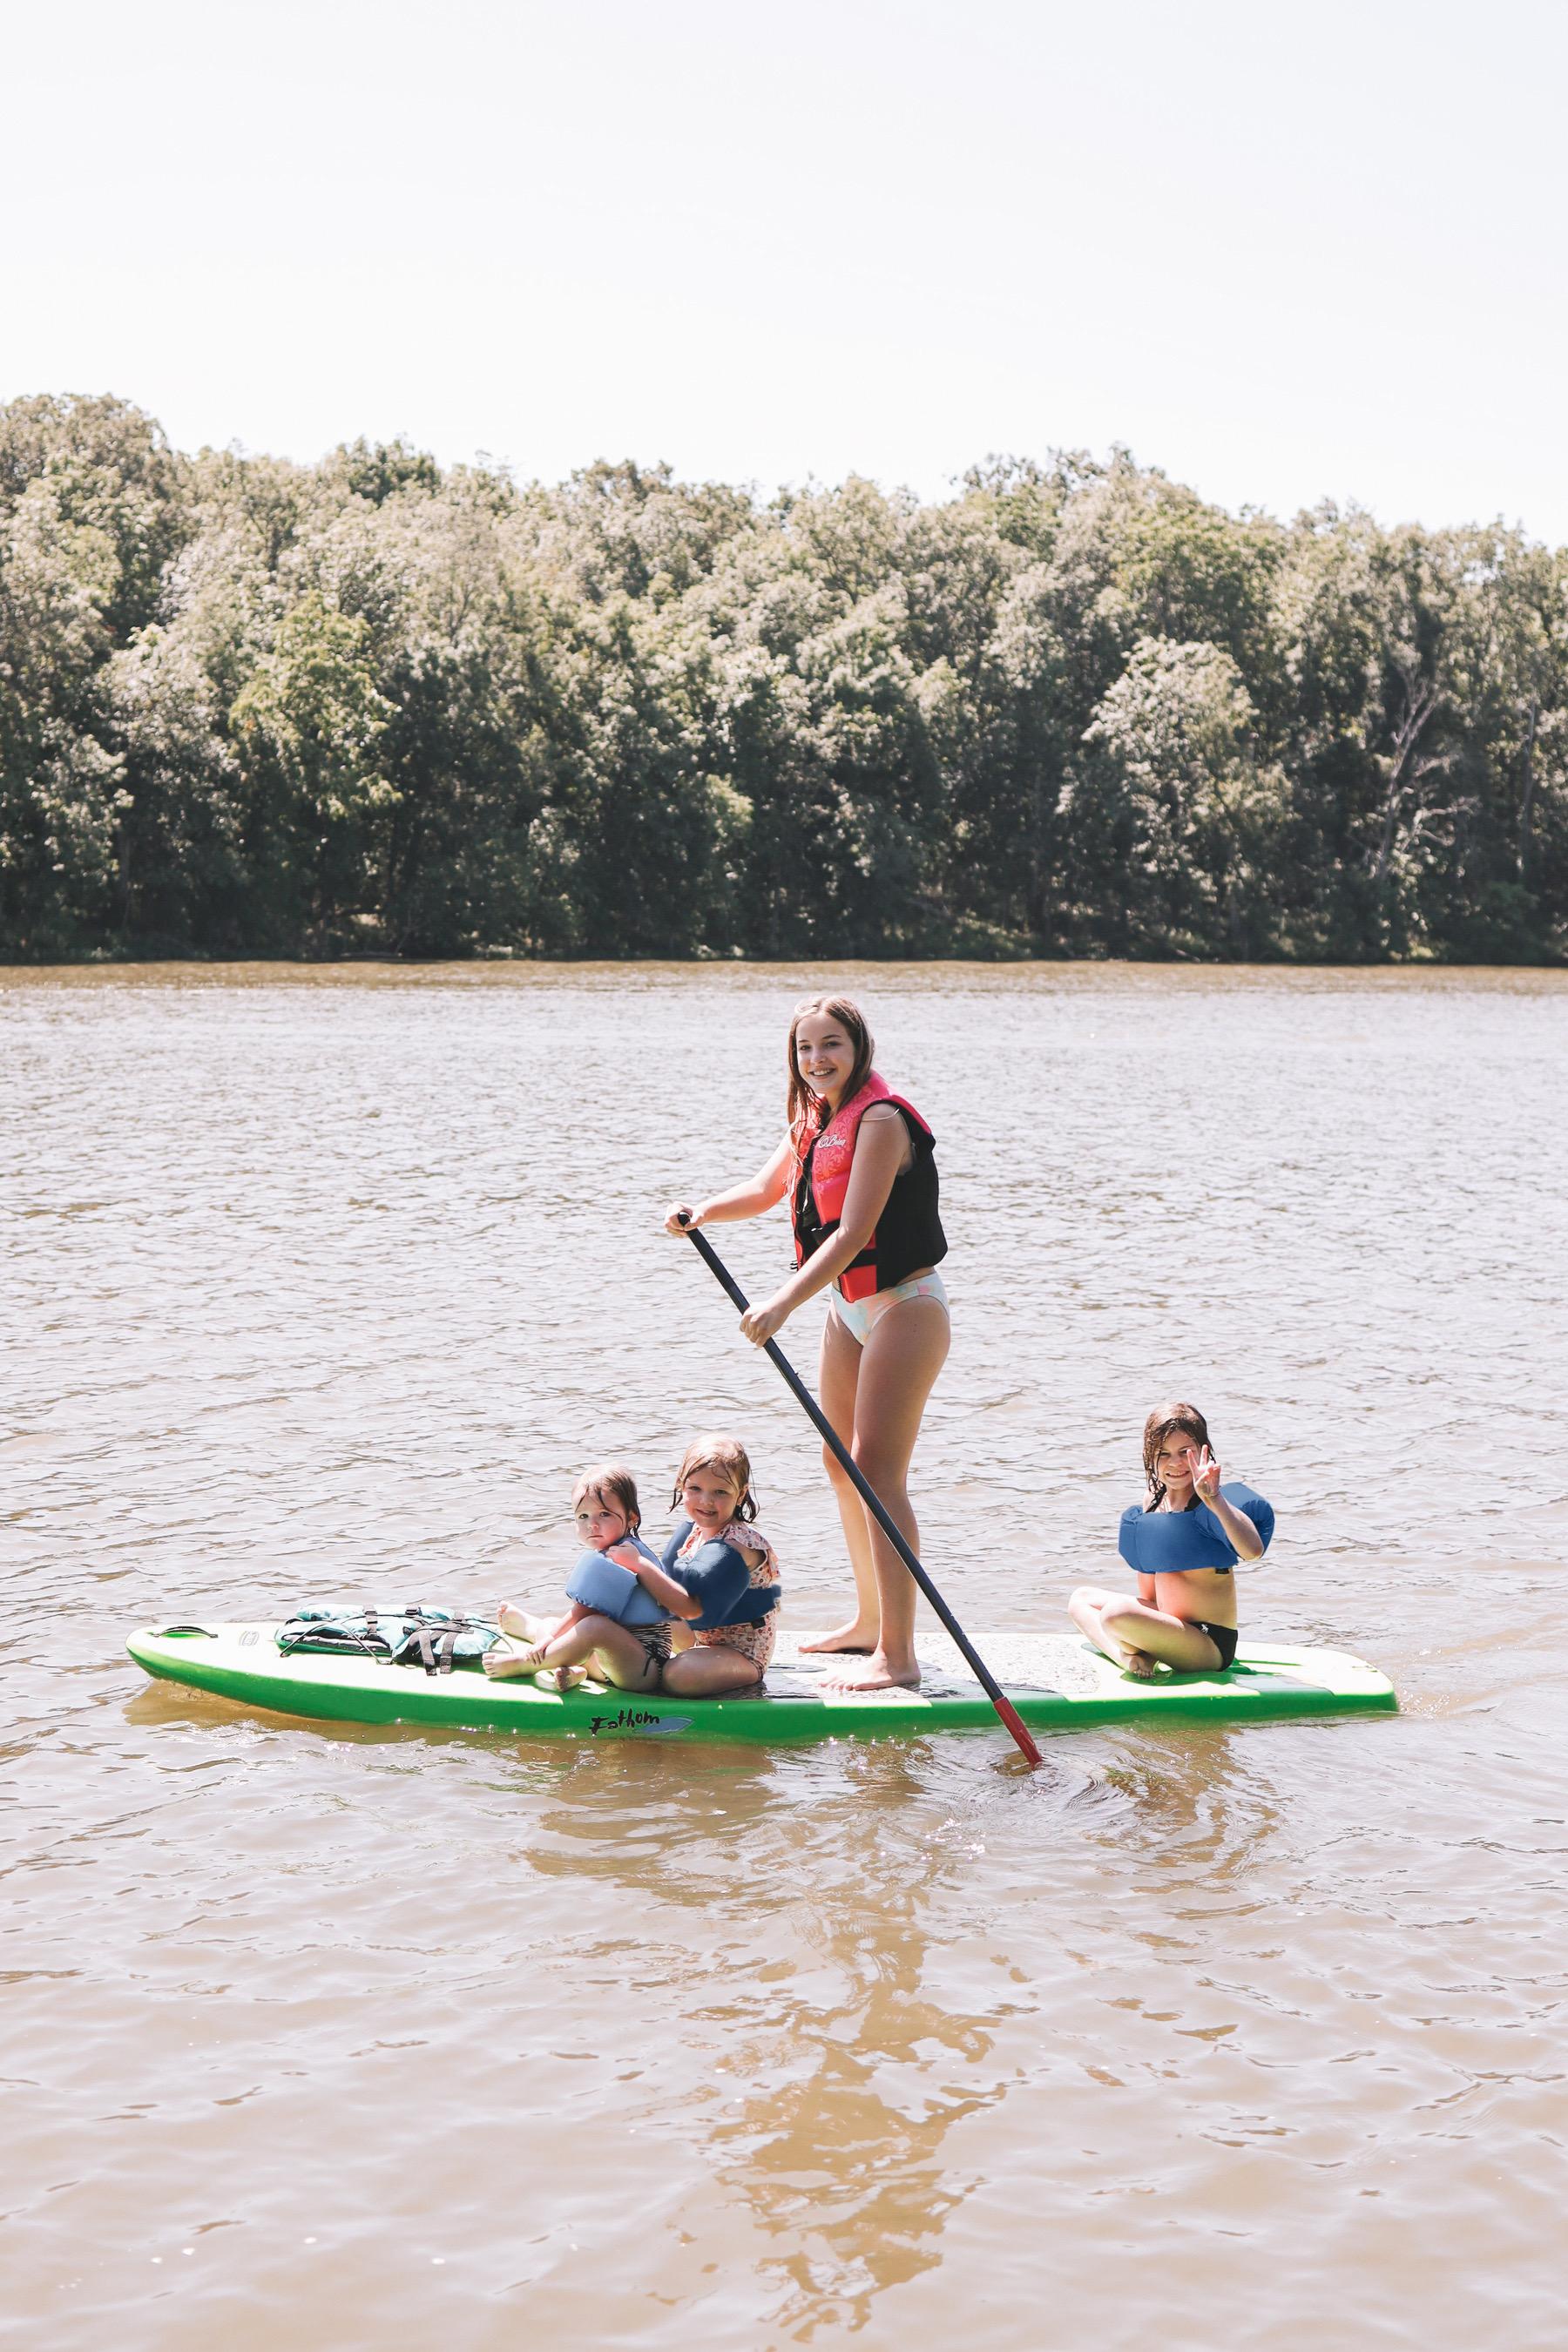 Kids paddle boarding Gammy Camp 2021